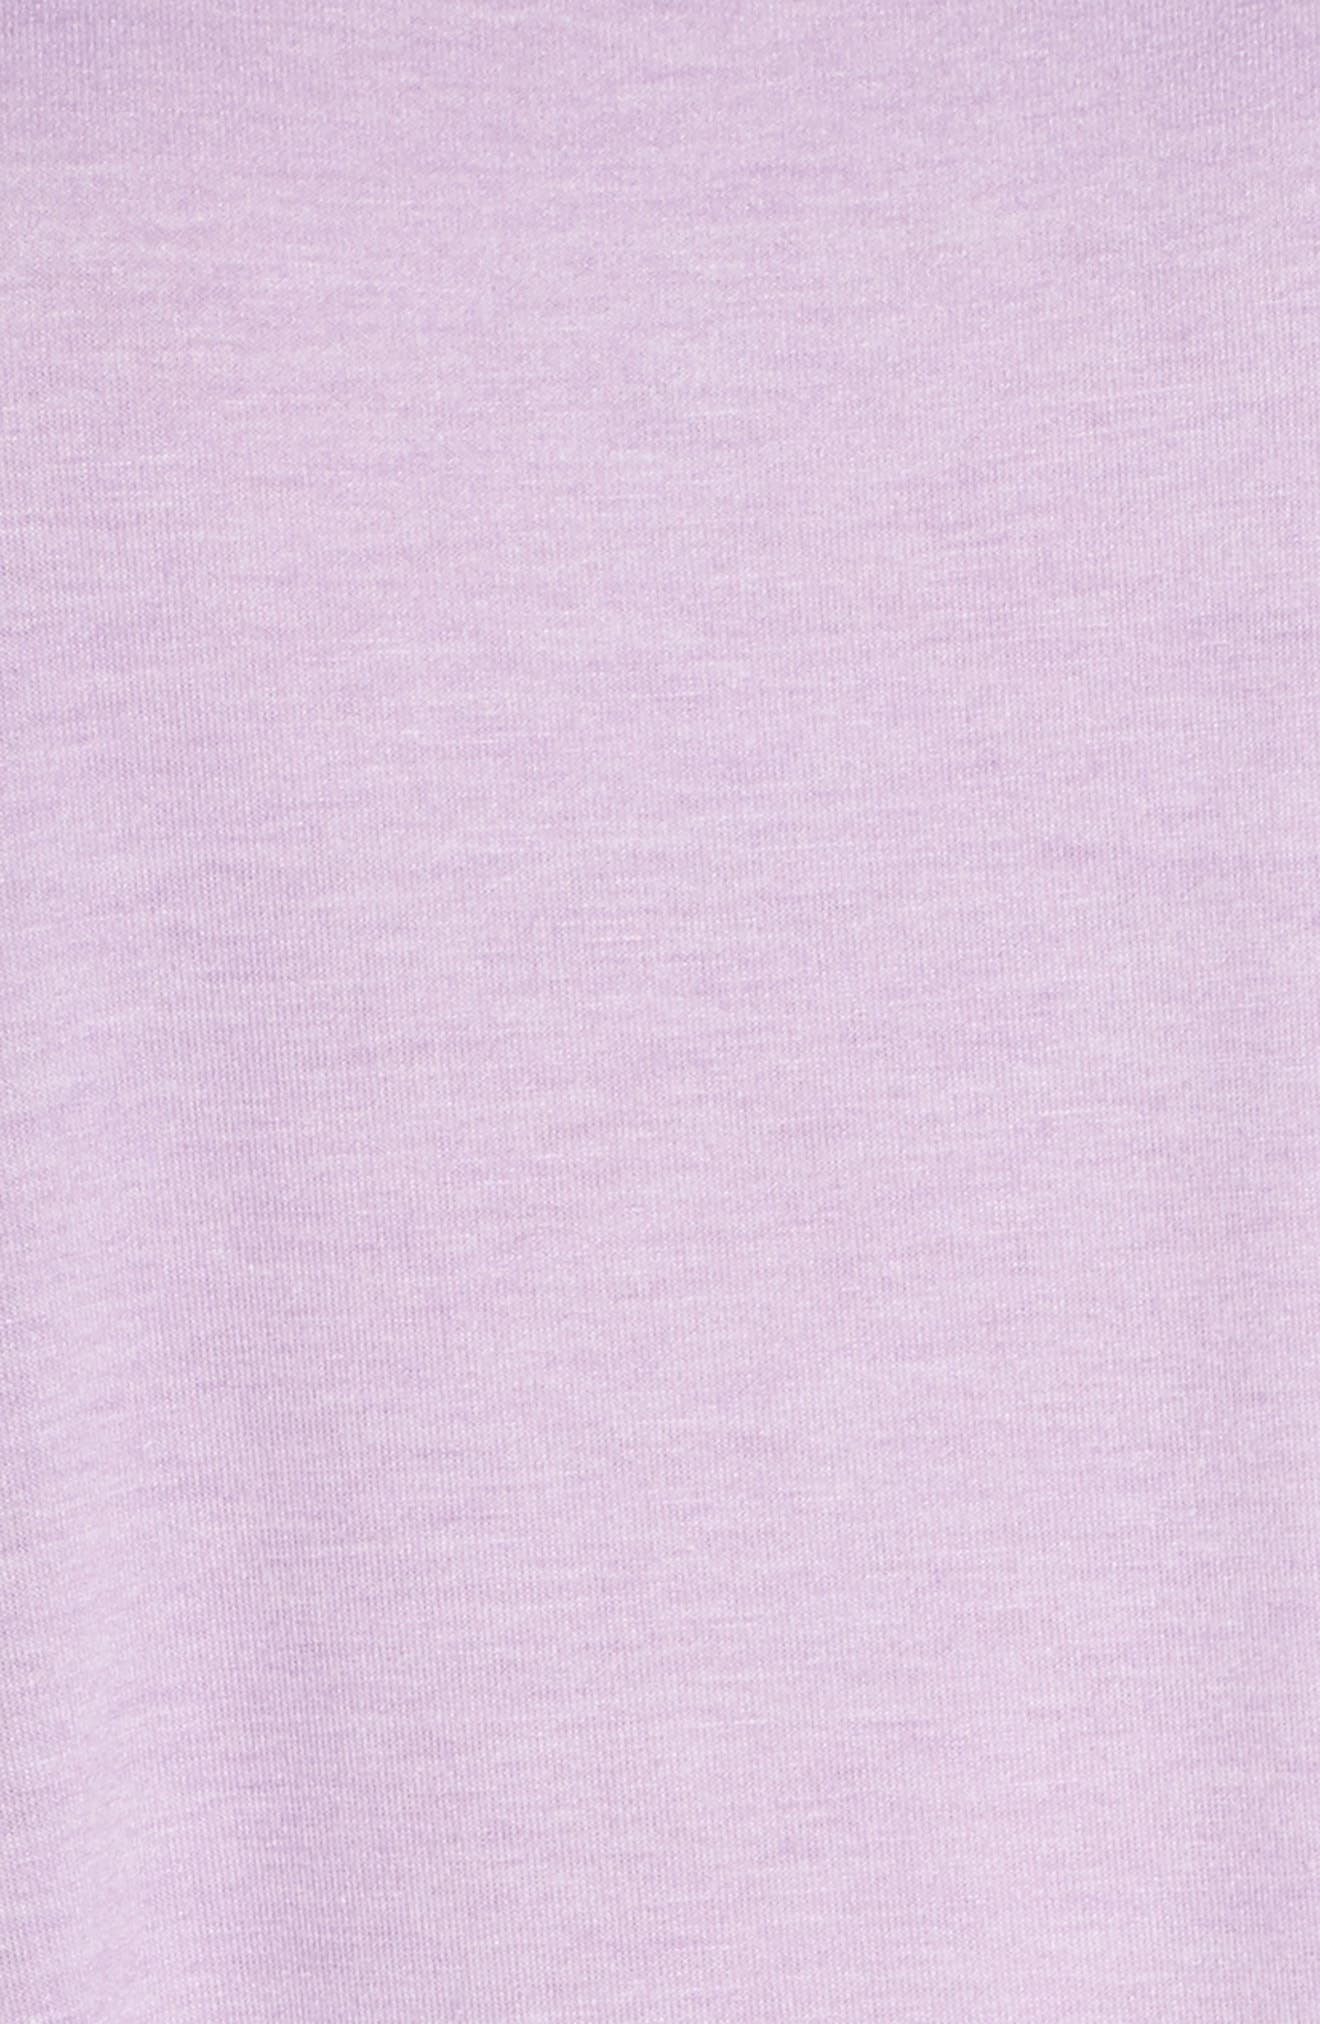 Honeydew All American Sleep Shirt,                             Alternate thumbnail 34, color,